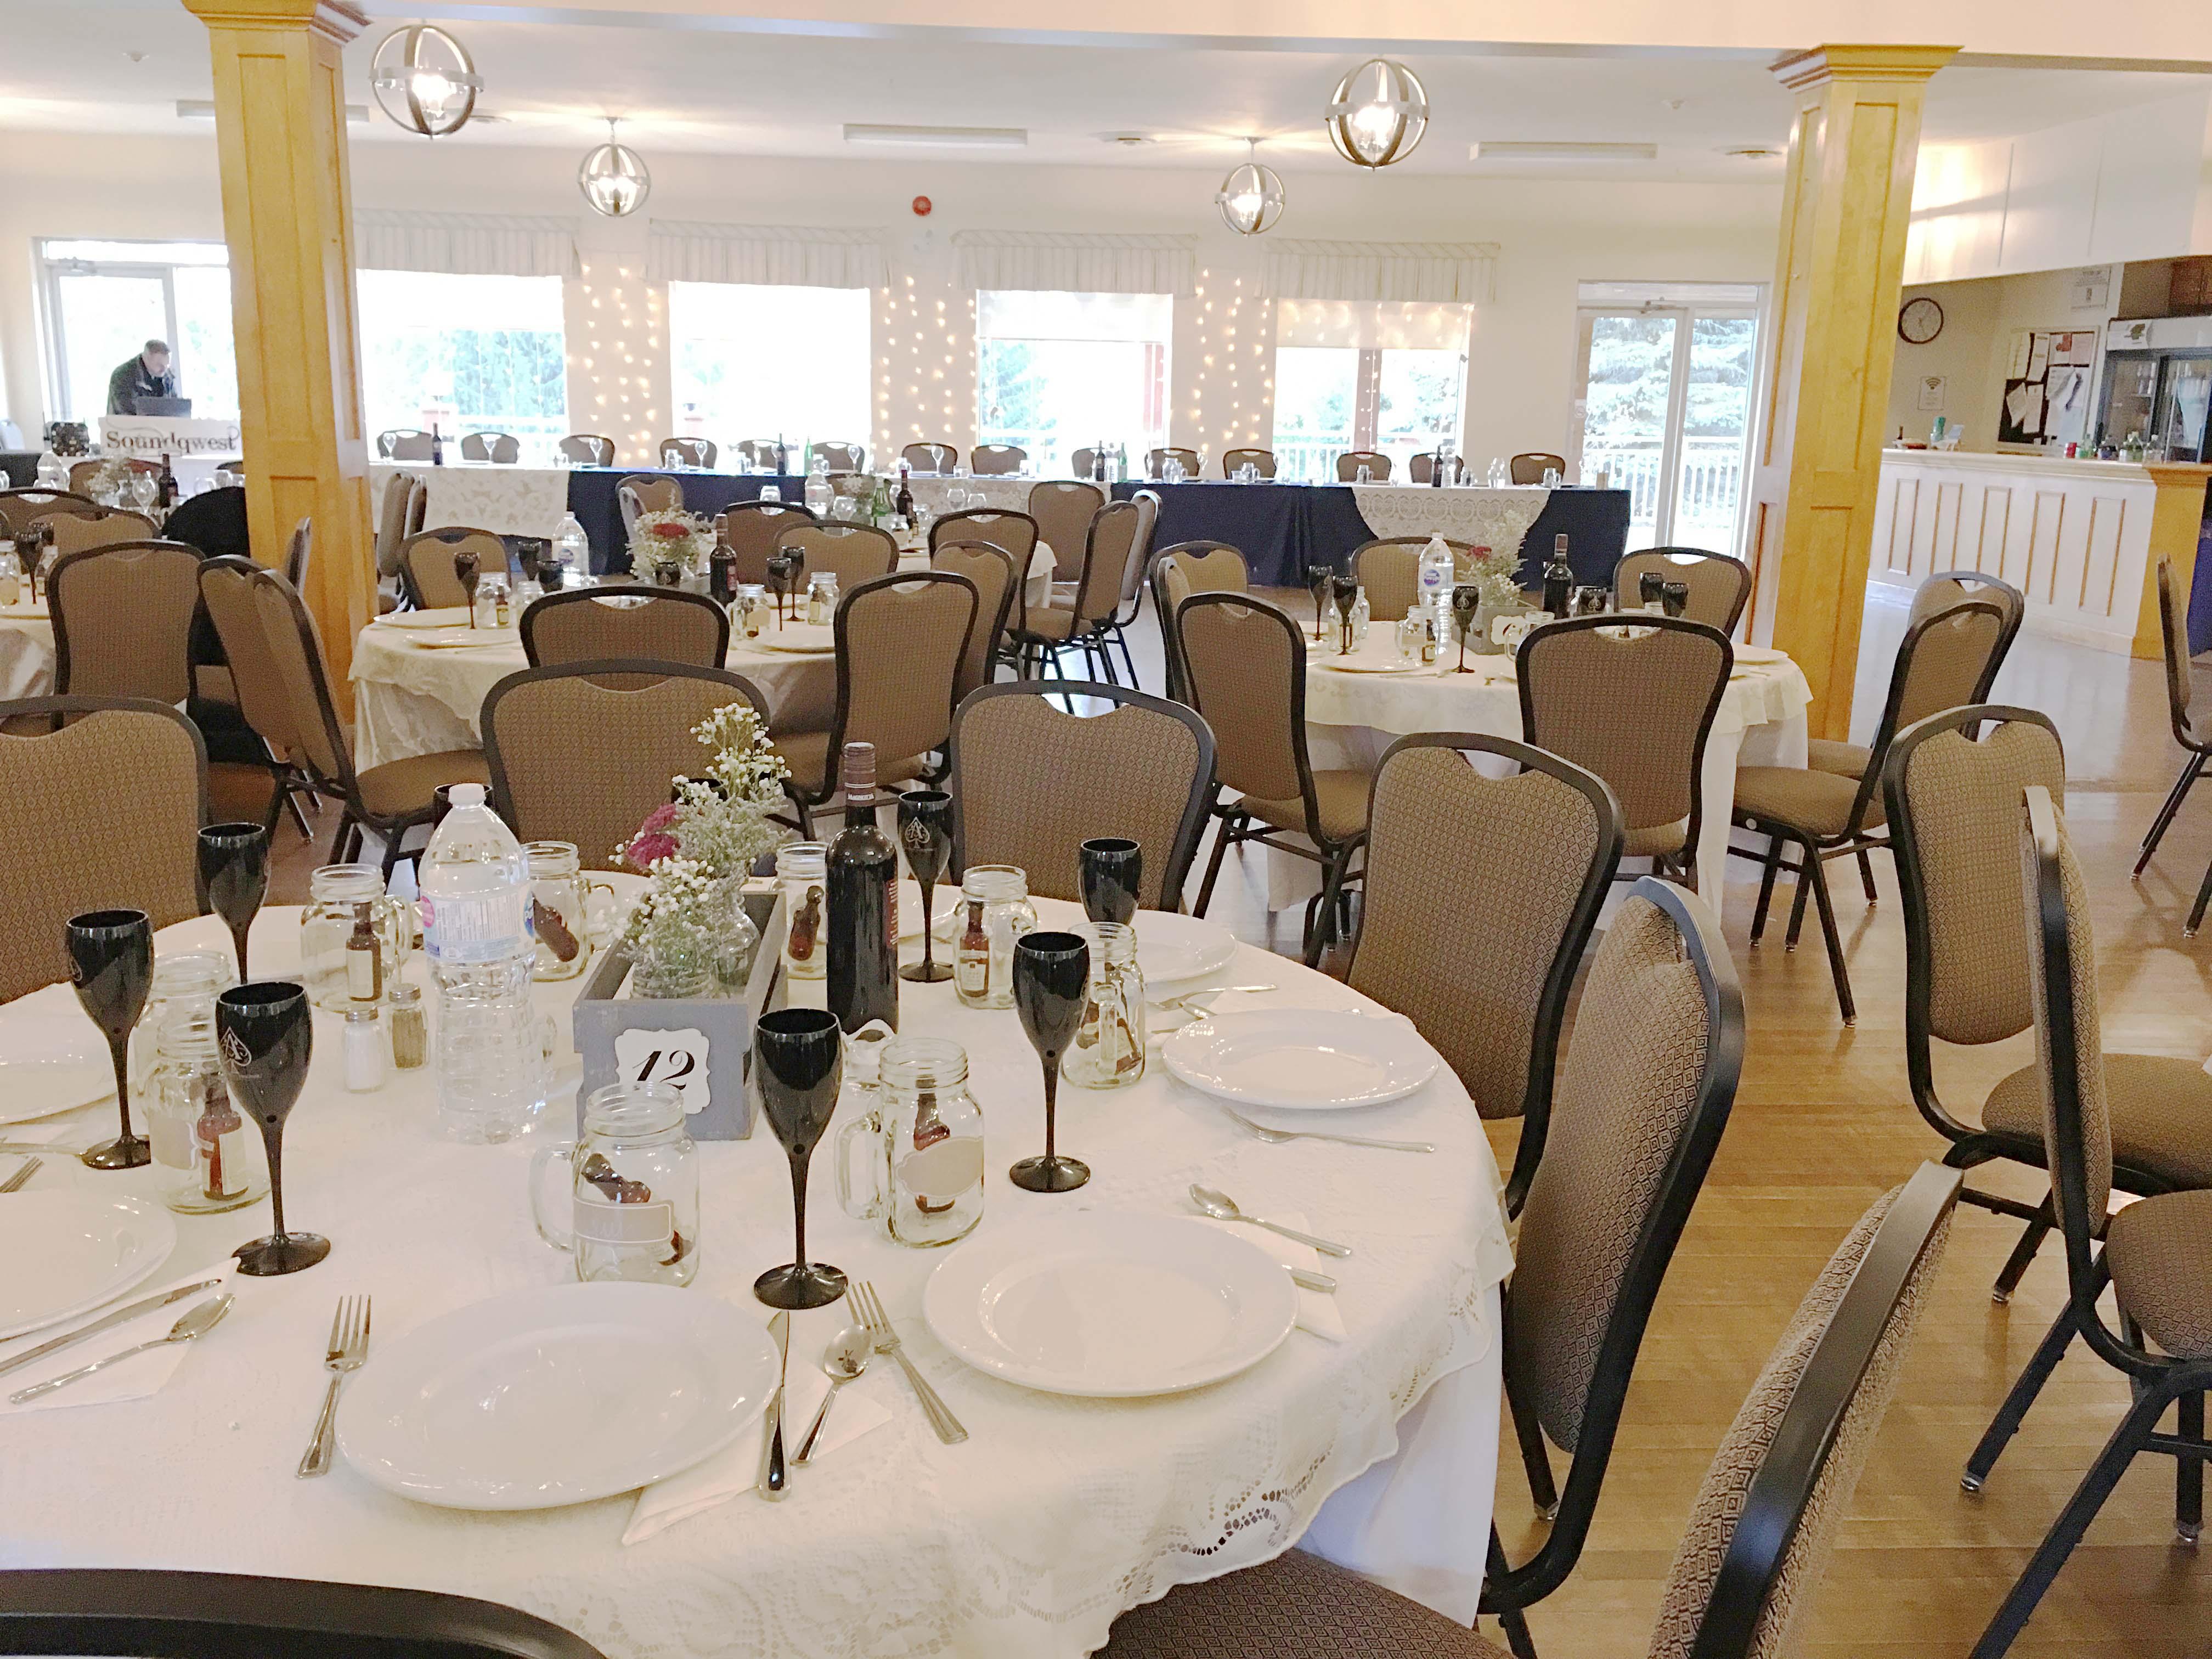 Mono Community Centre Banquet Room Decorated